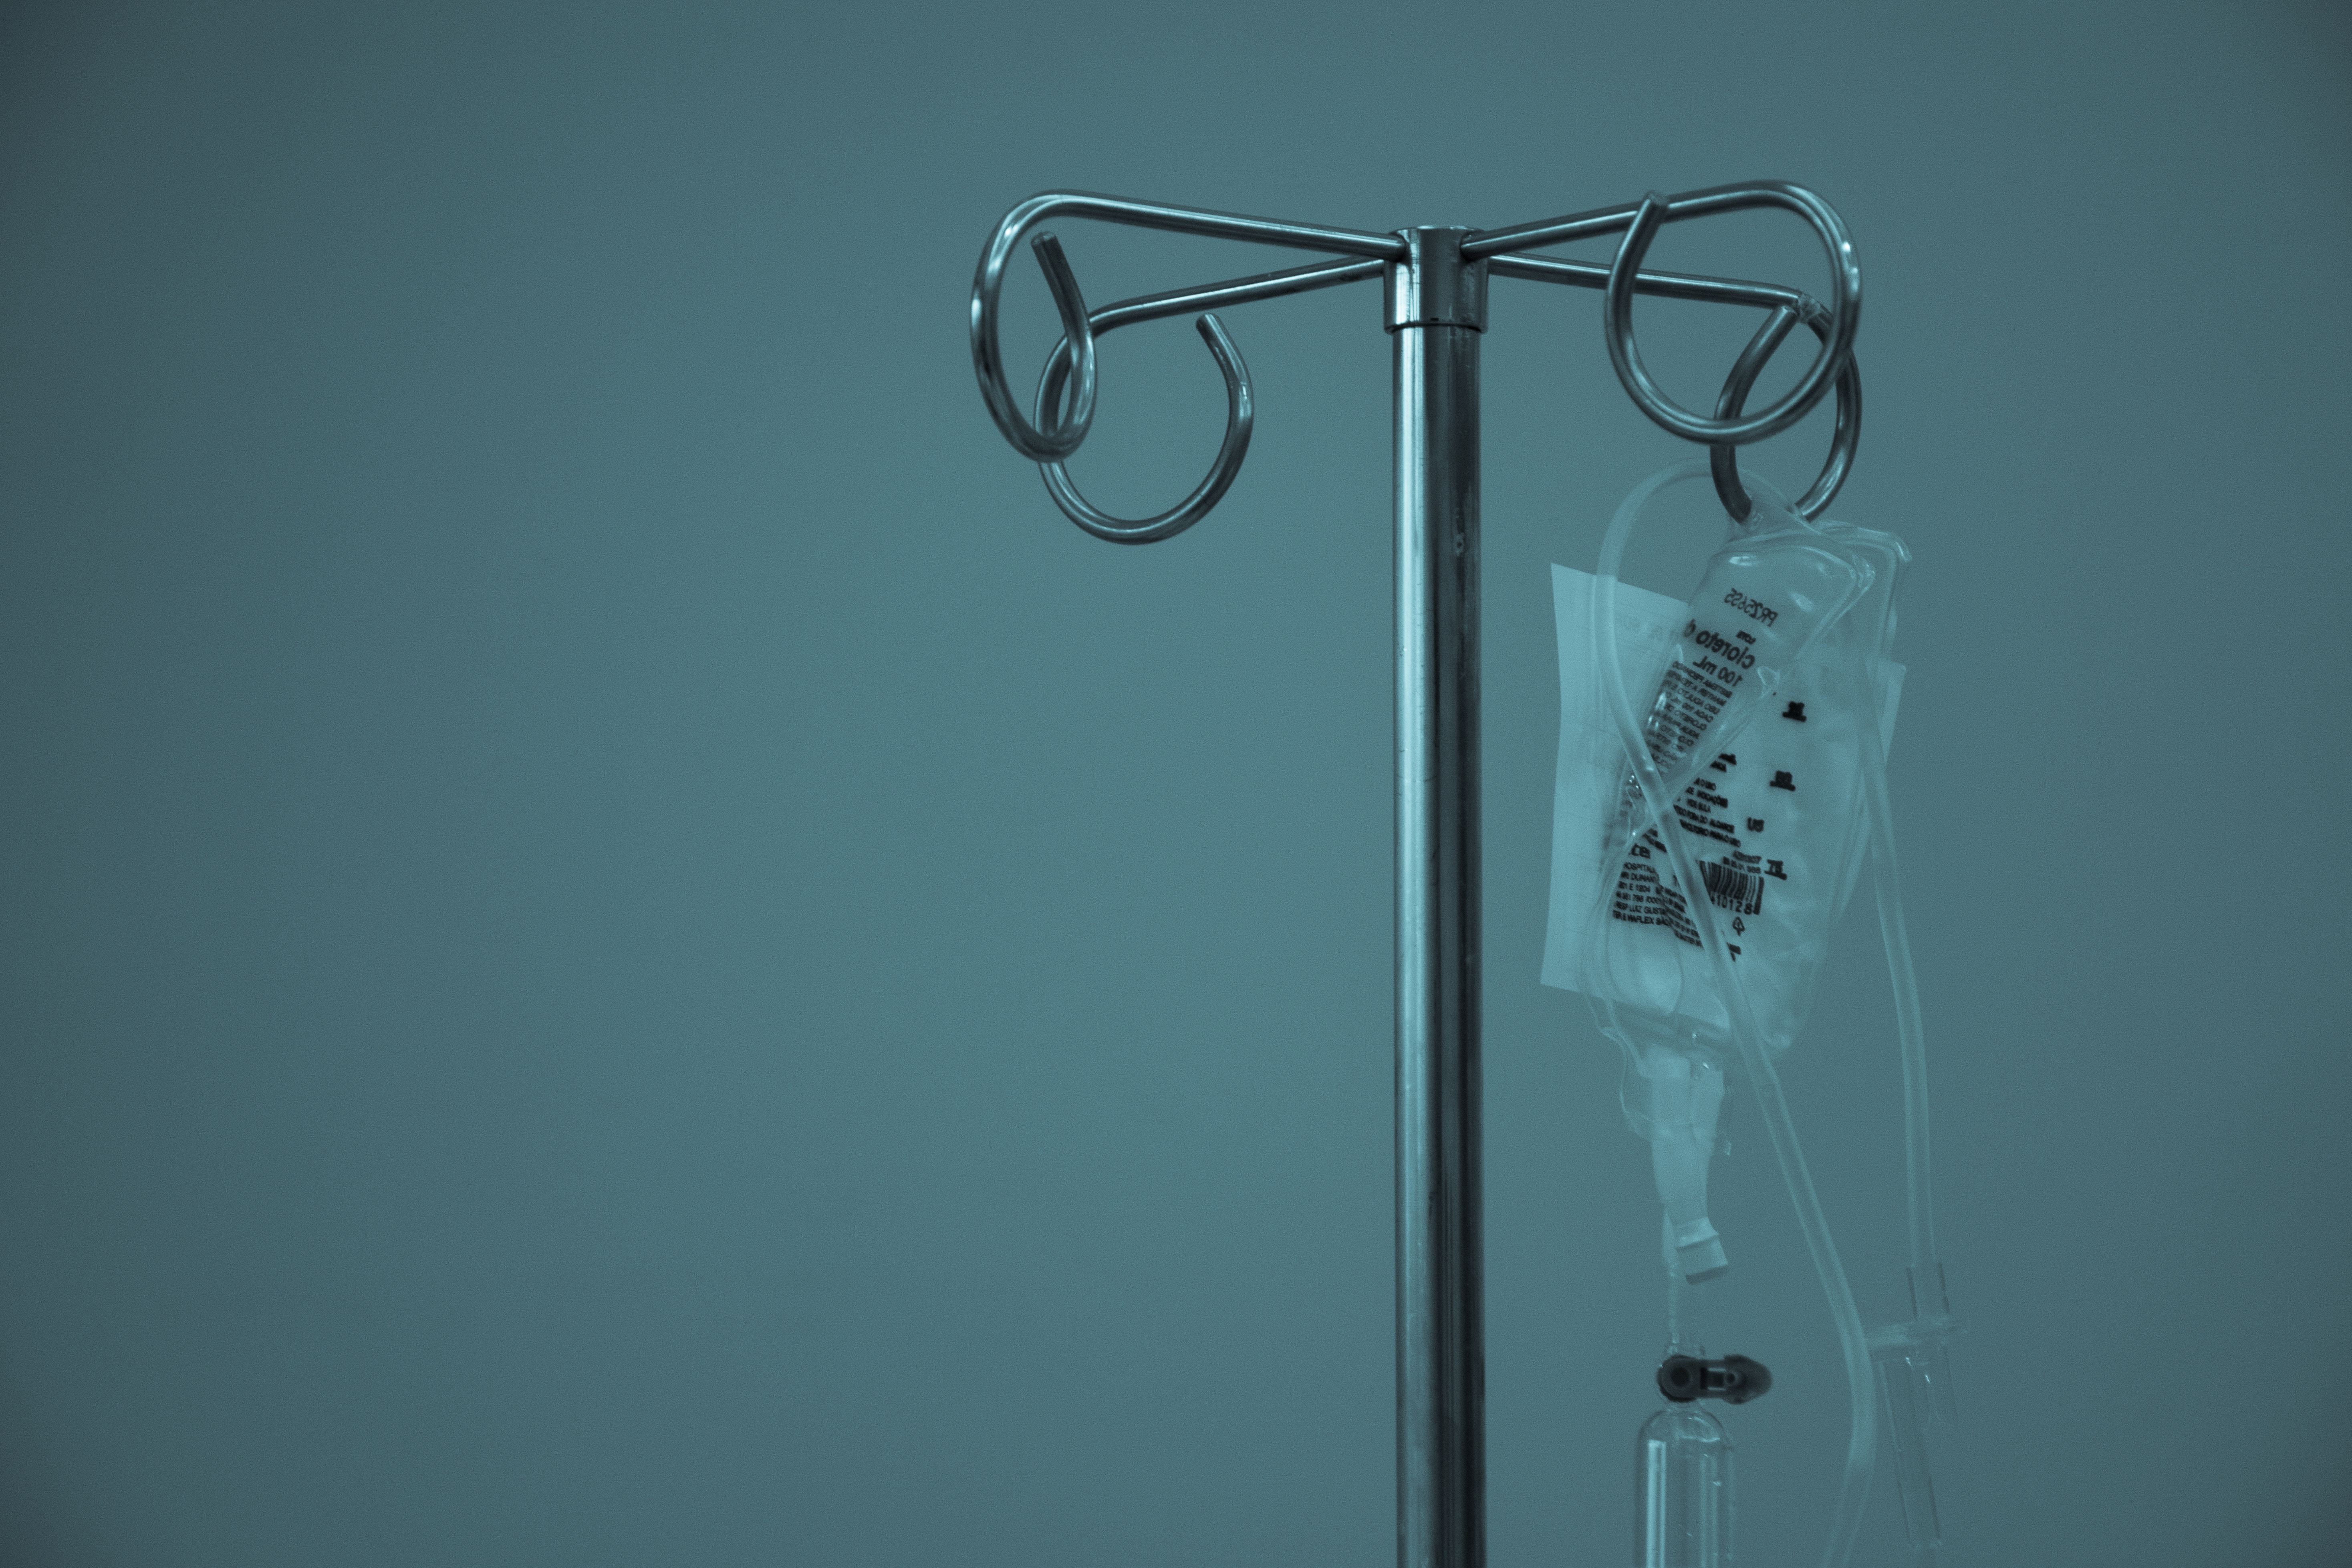 Hospital medication tube and bag